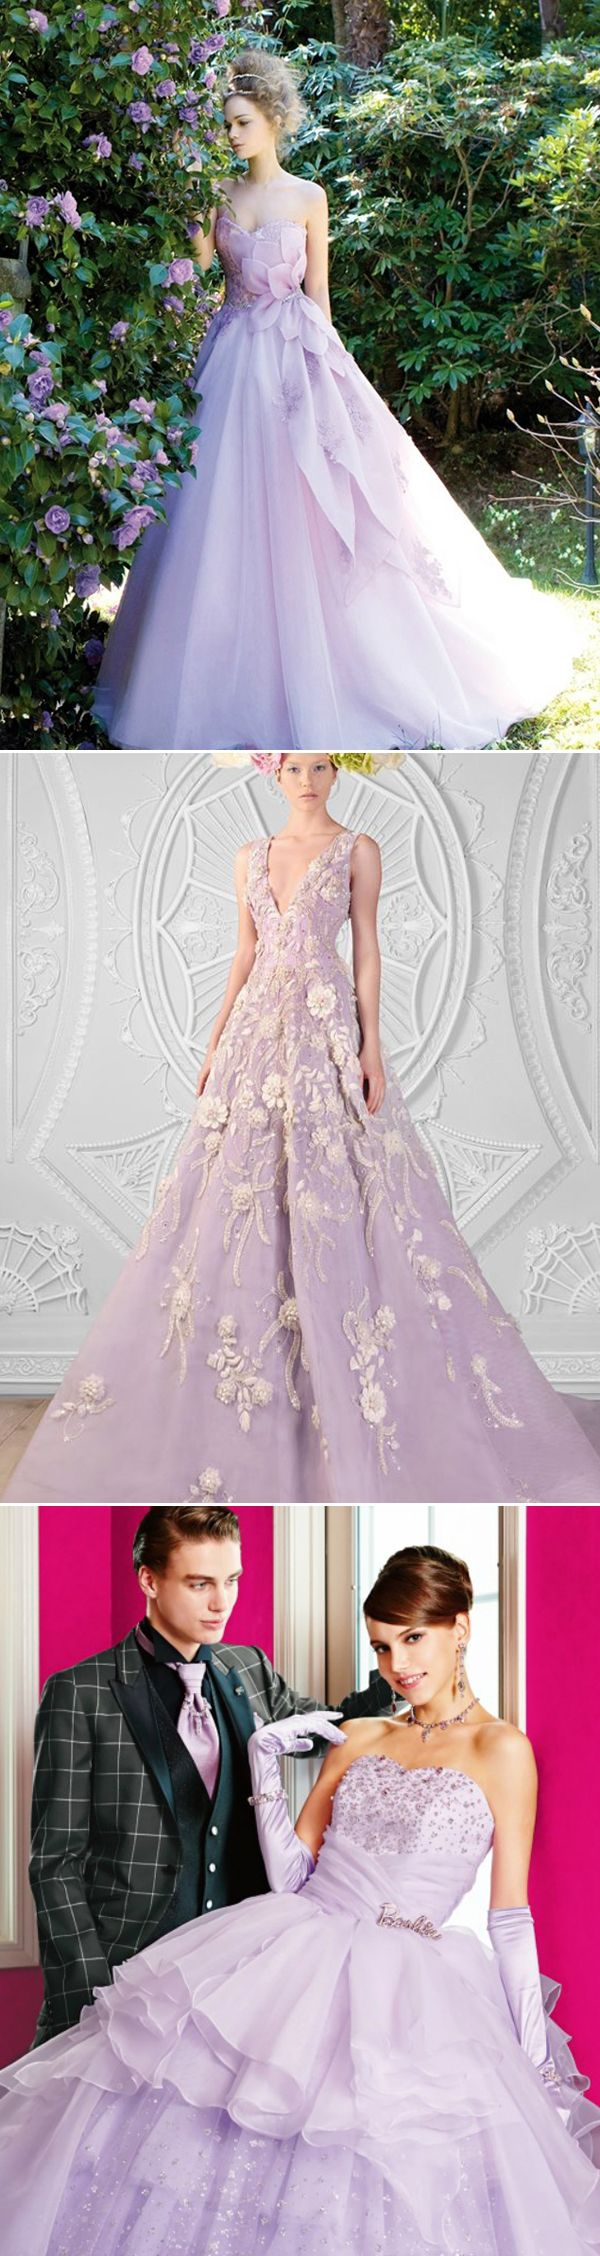 30 Oh-So-Romantic Pastel Wedding Dresses - Honey Lavender